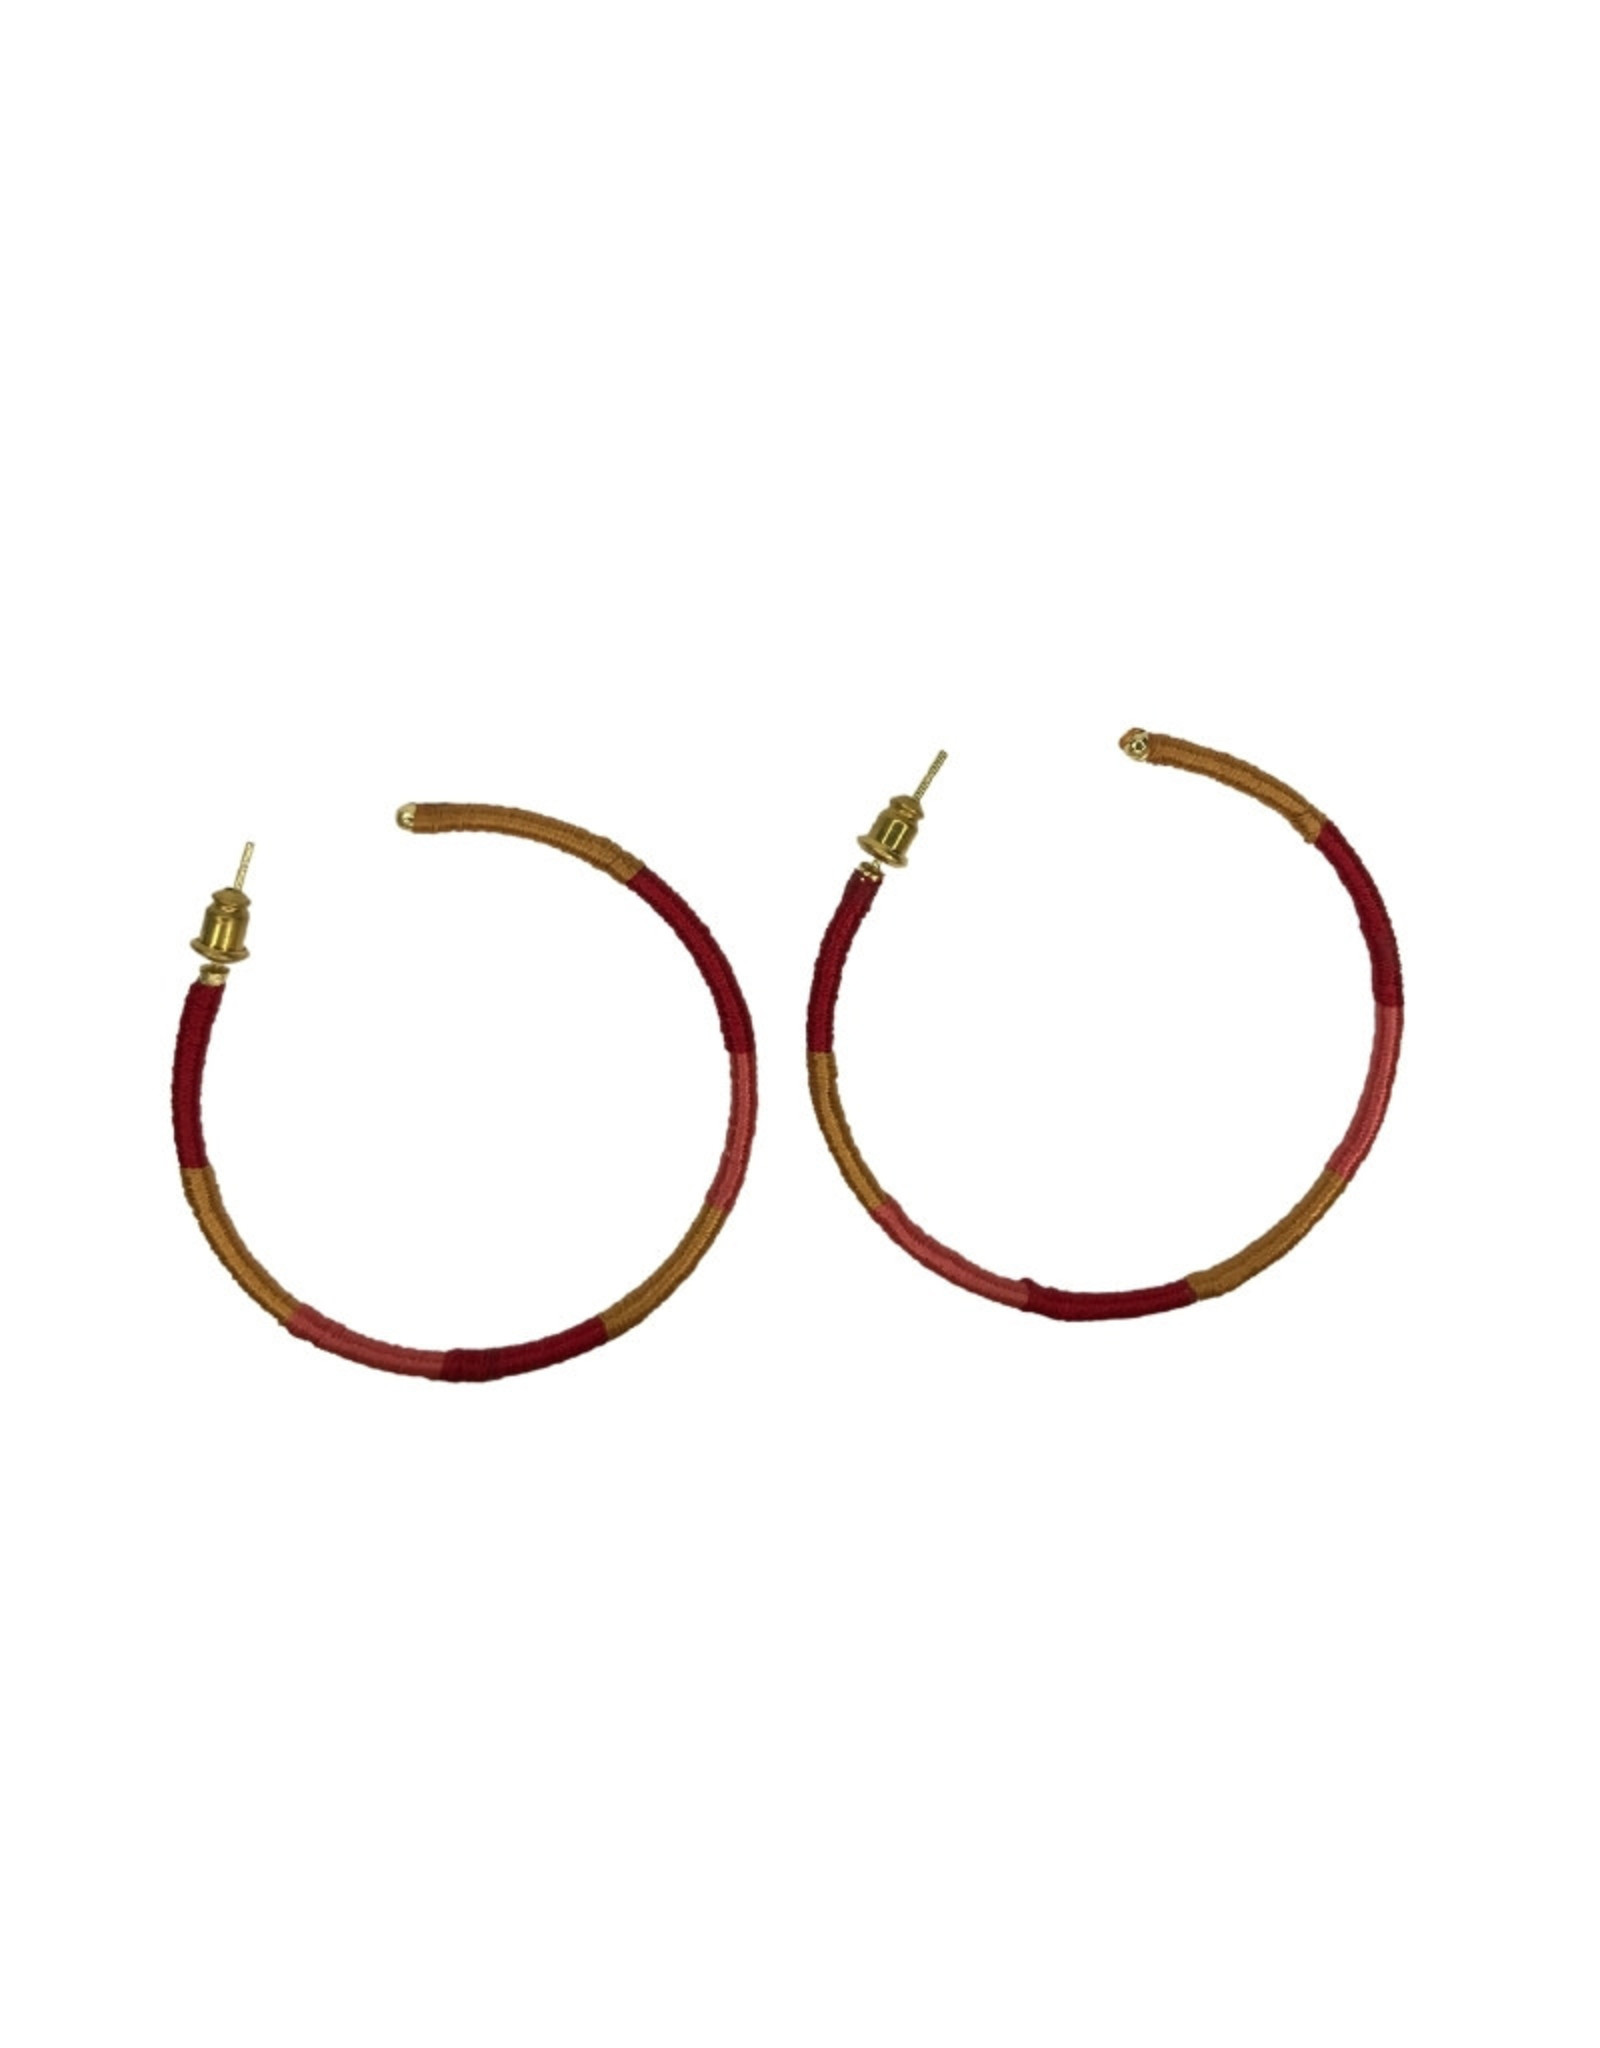 Ten Thousand Villages Earrings Hoop Red/Gold Thread